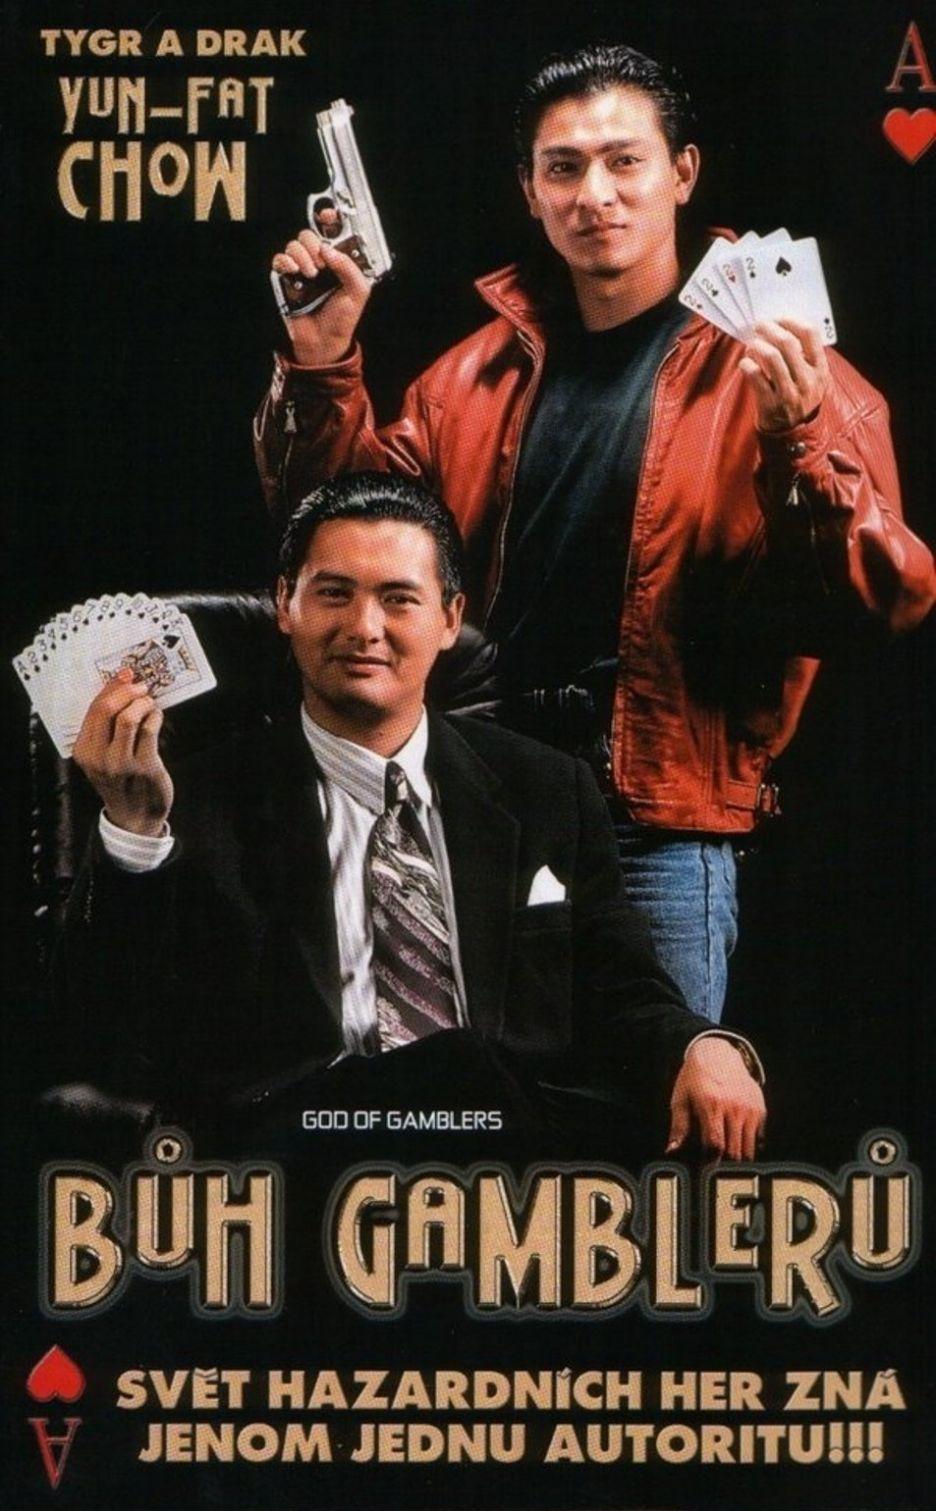 Gambling God